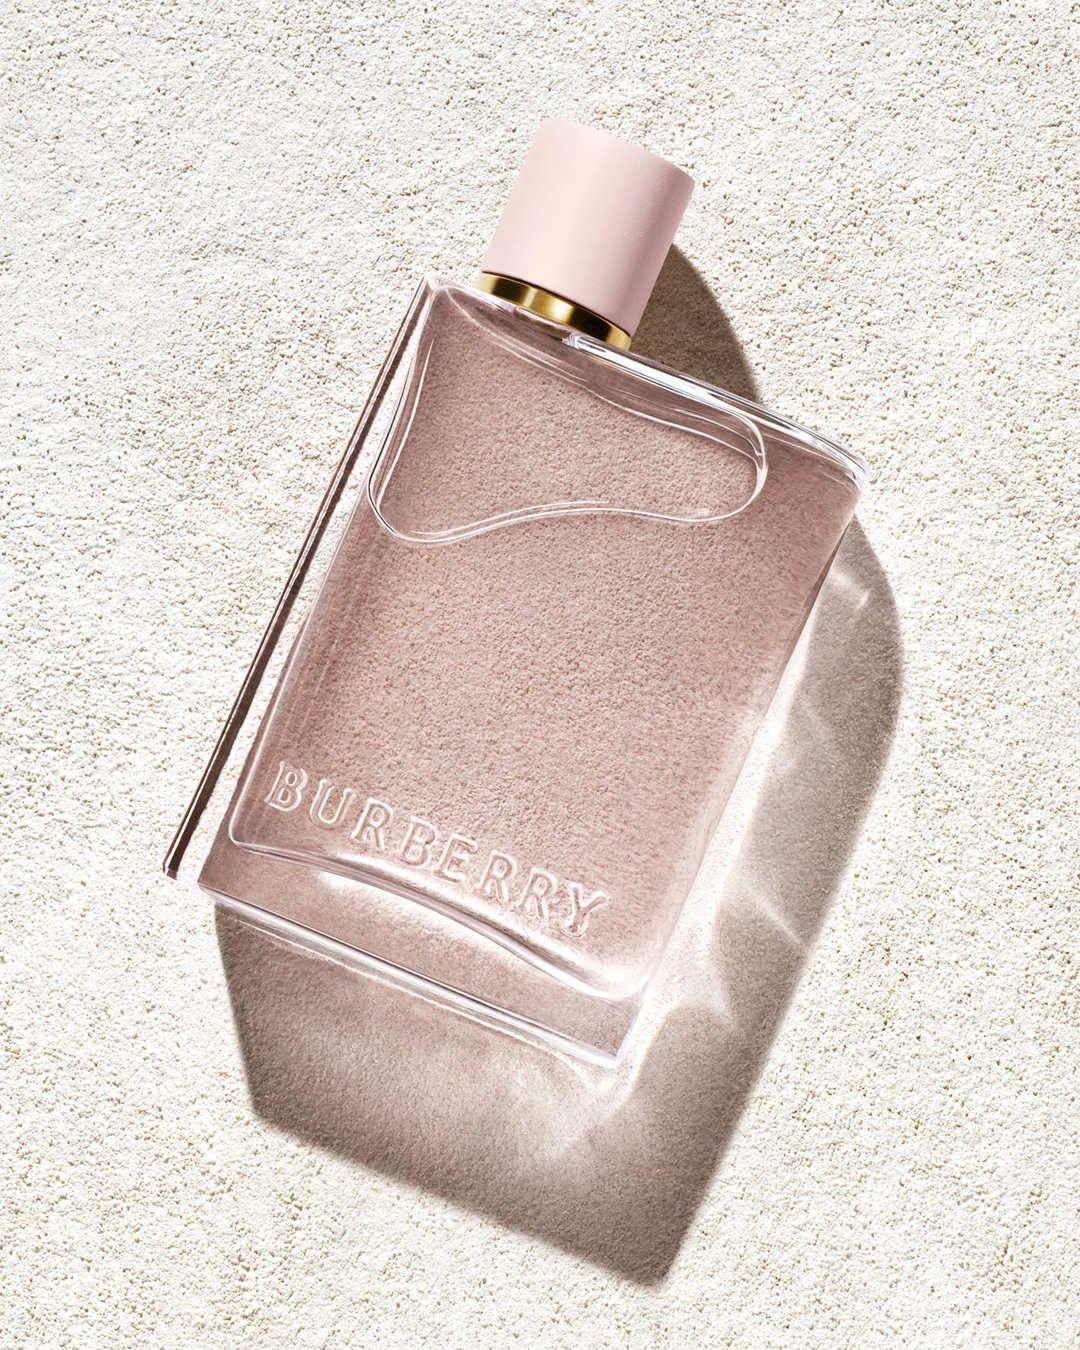 burberry perfumes macys